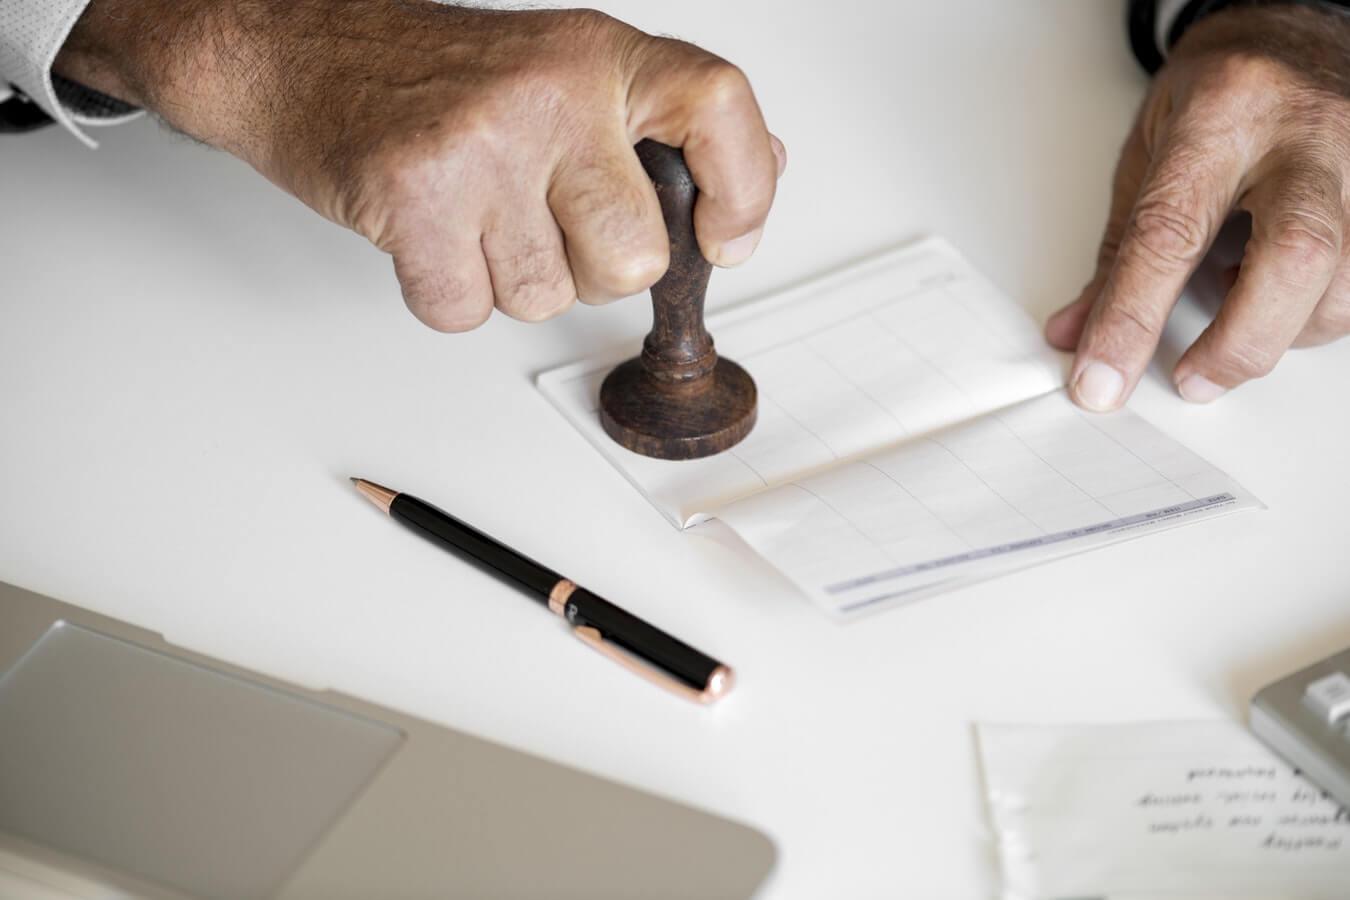 кредит без справки о доходах, быстрый кредит, кредит онлайн